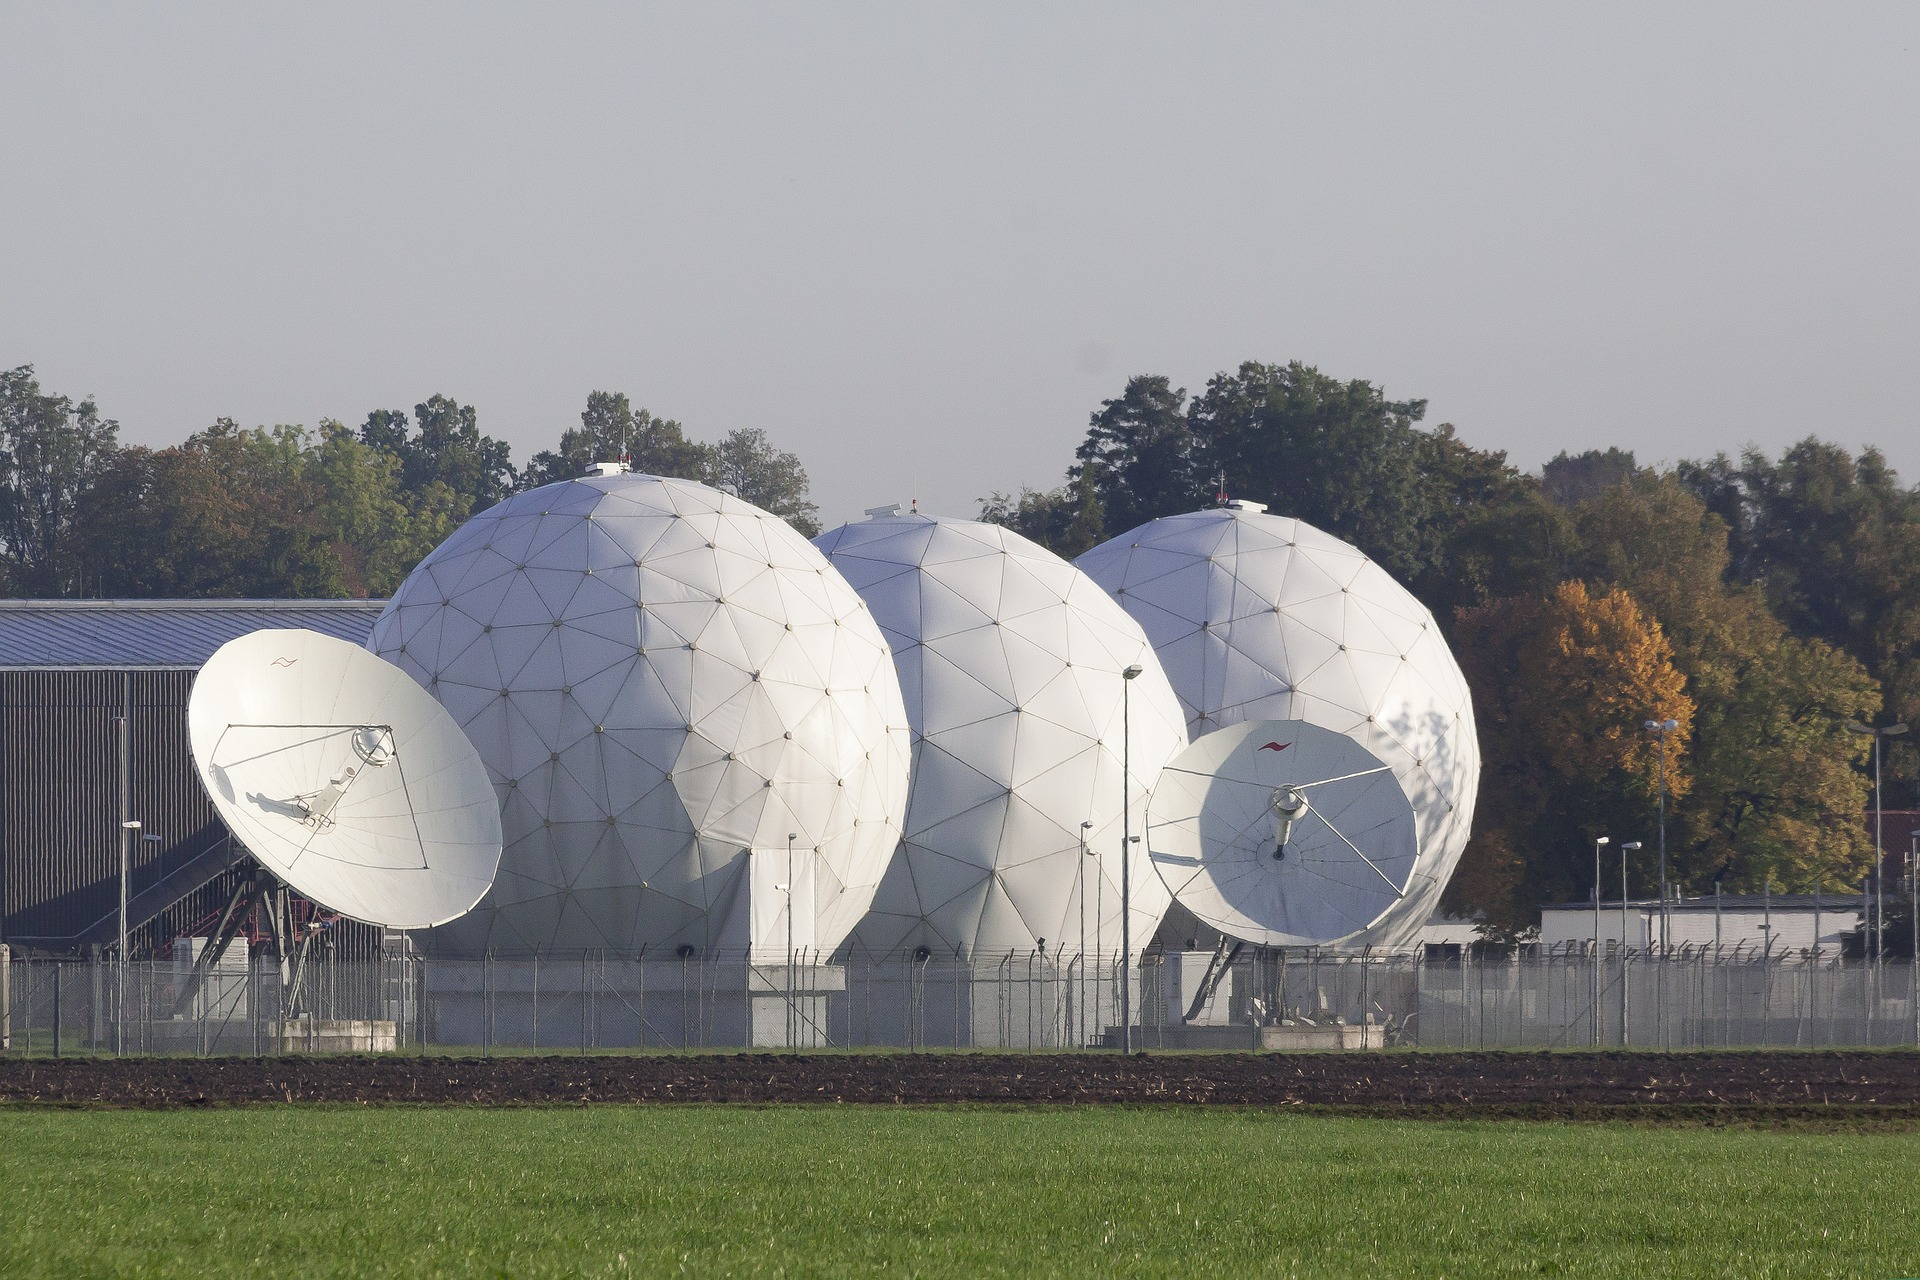 radar-2799606_1920.jpg